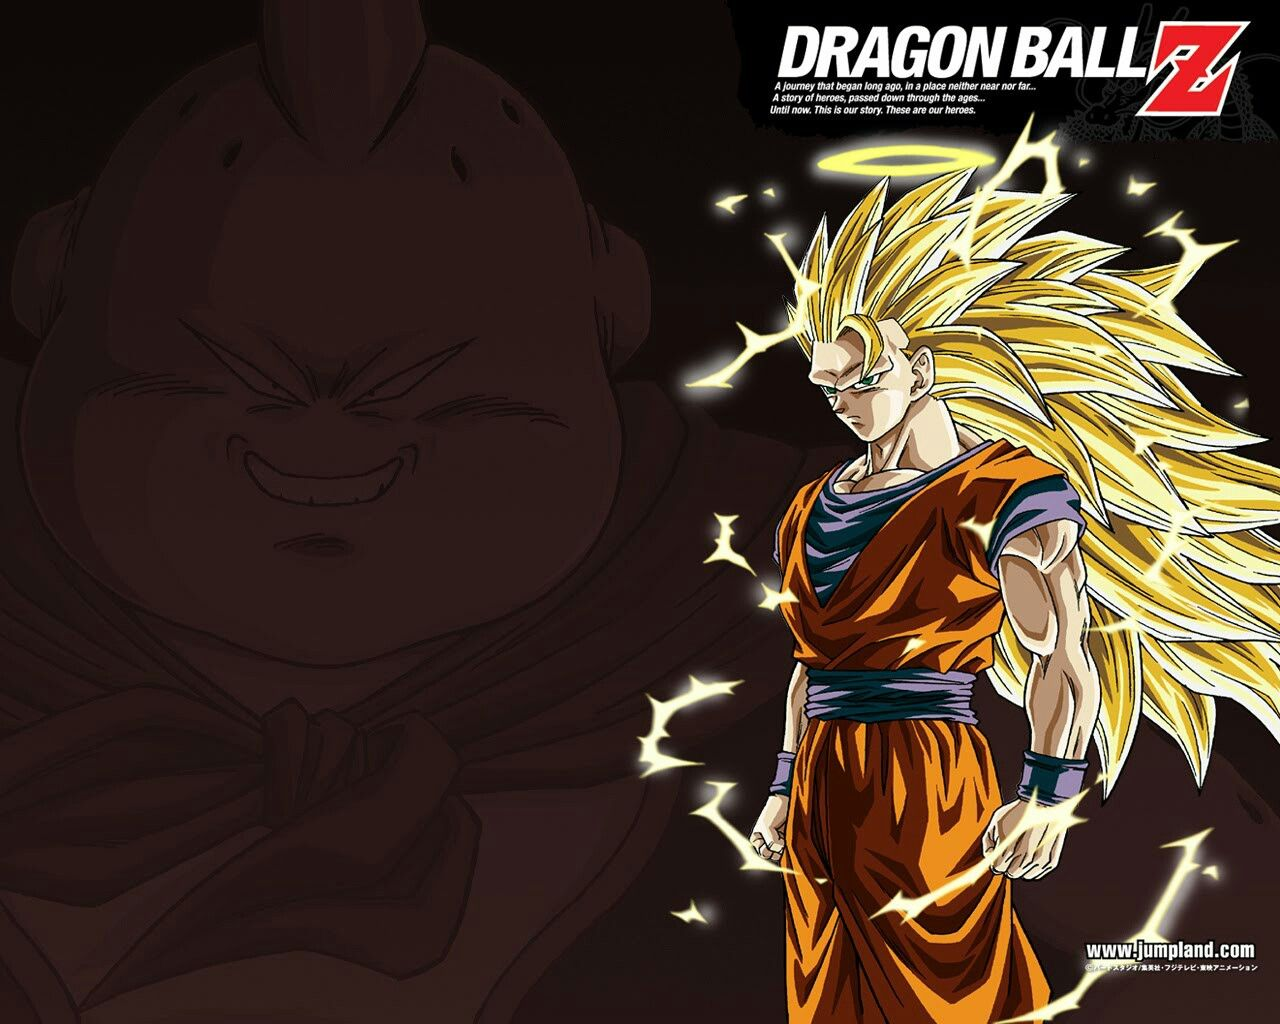 Ssj3 Goku W Dragonball Z Wallpaper Z Wallpaper